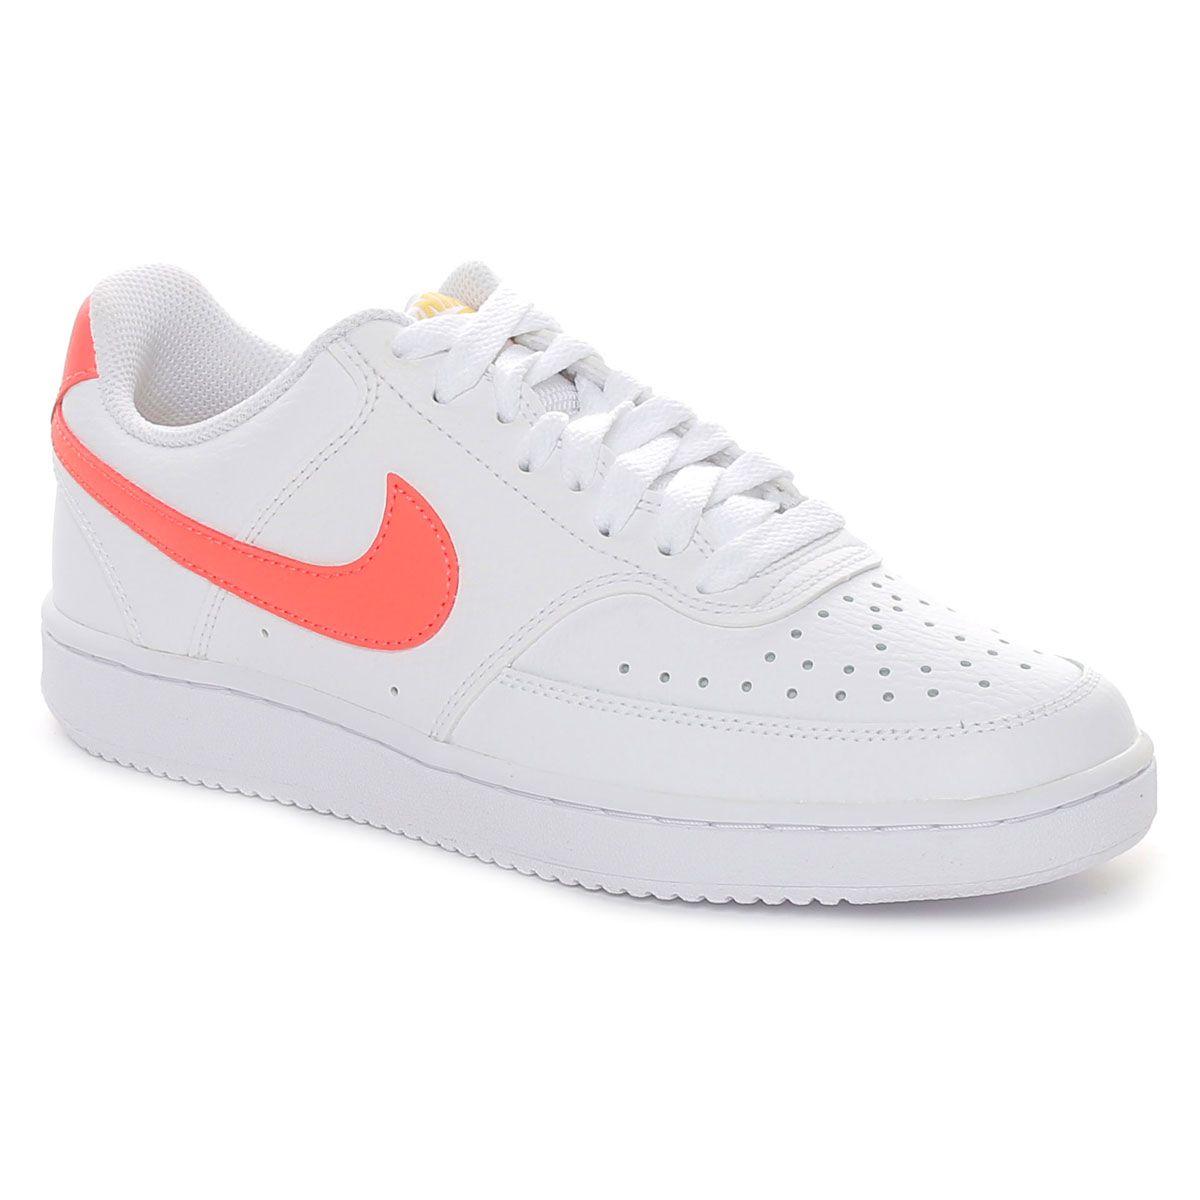 Nike Court Vision Low Donna Bianco Arancione